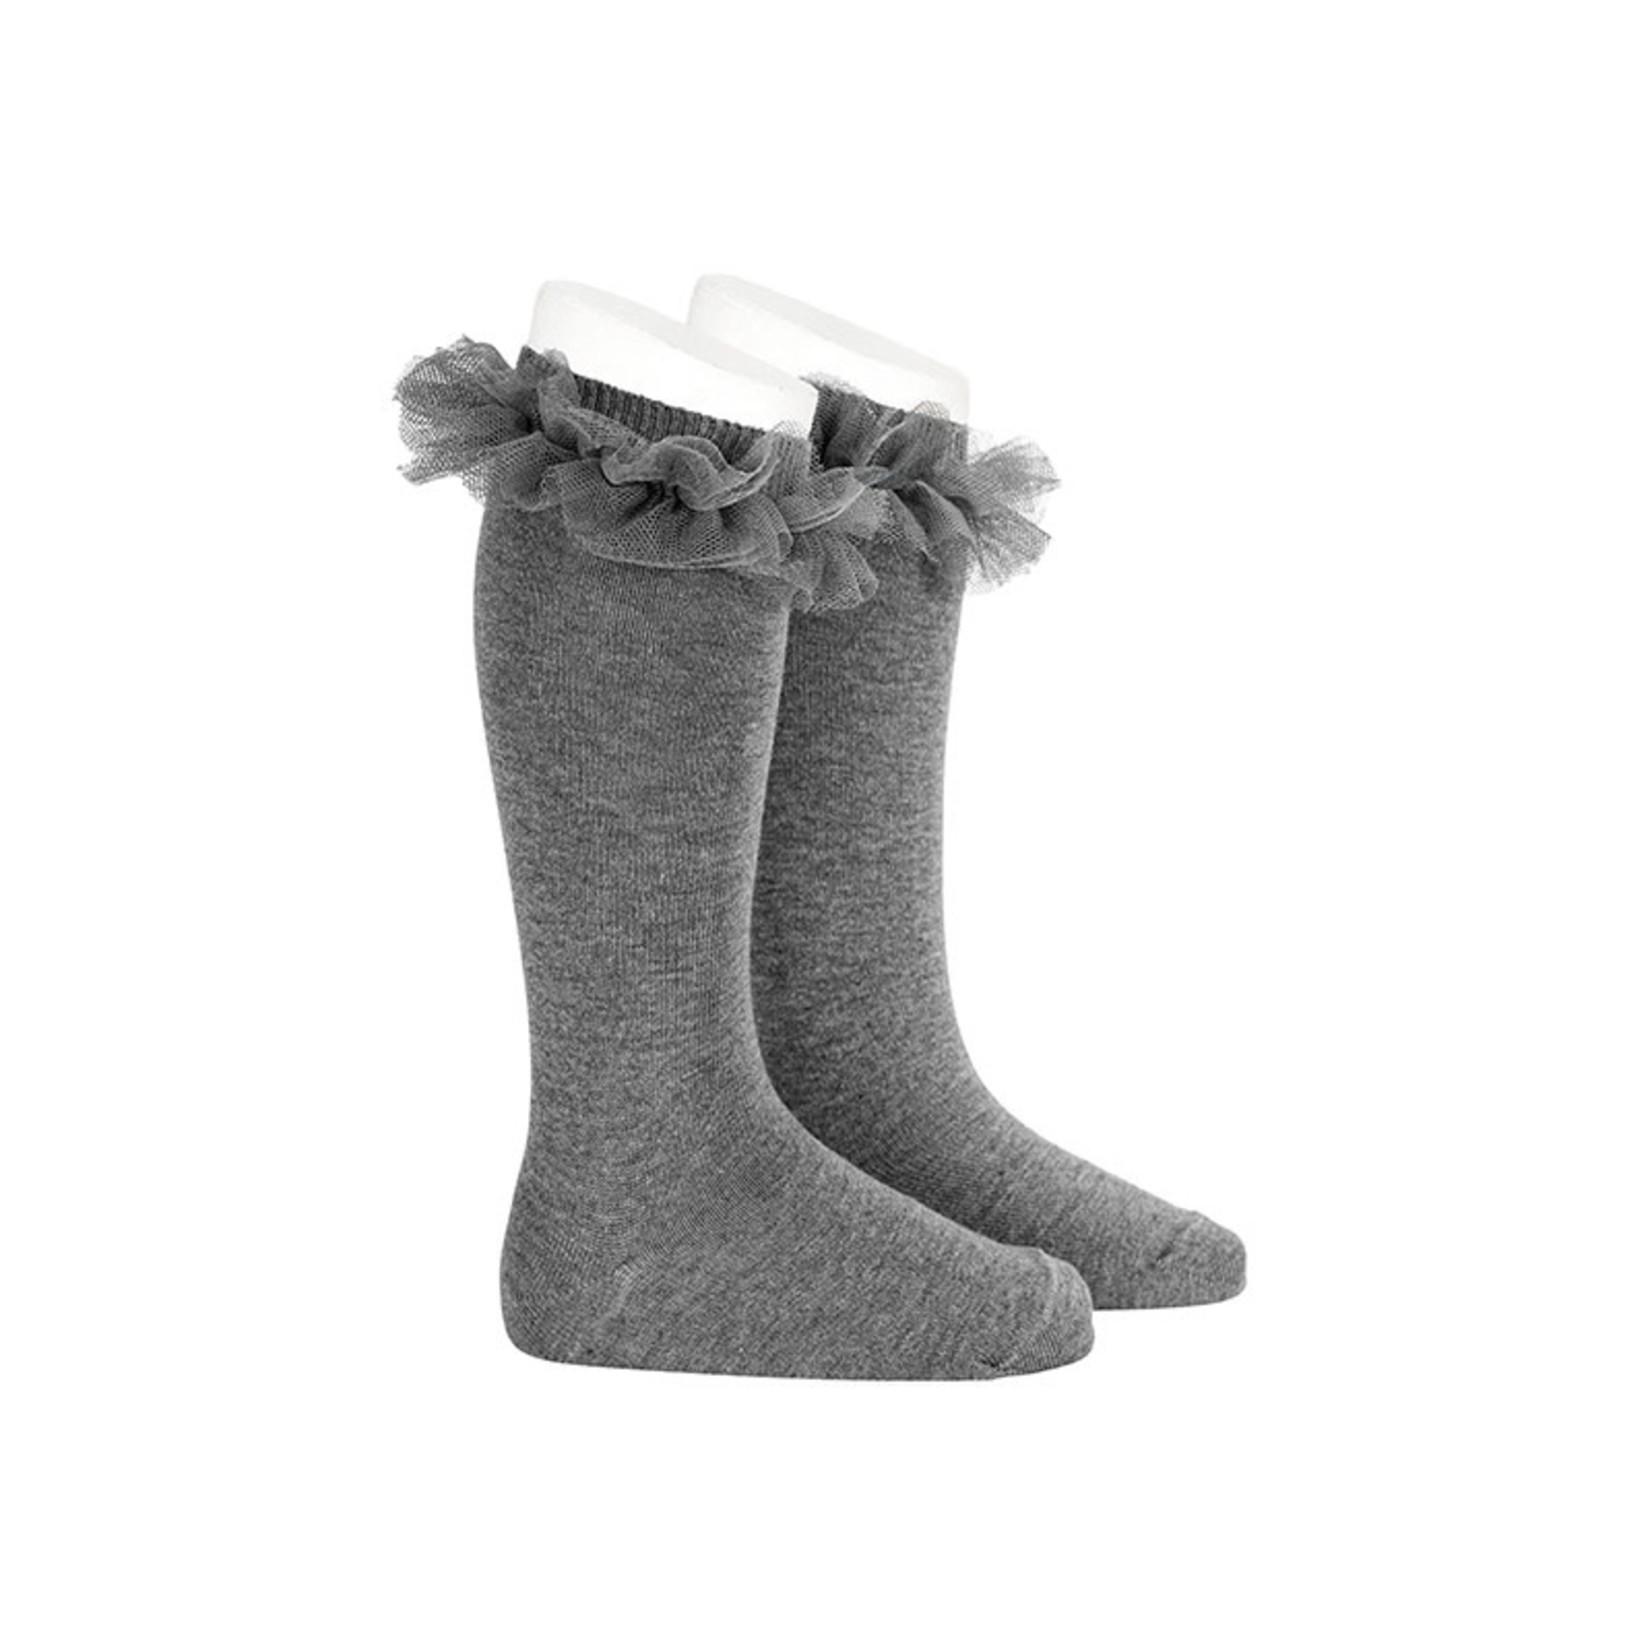 Condor Ruffle Socks Knee High - Gray